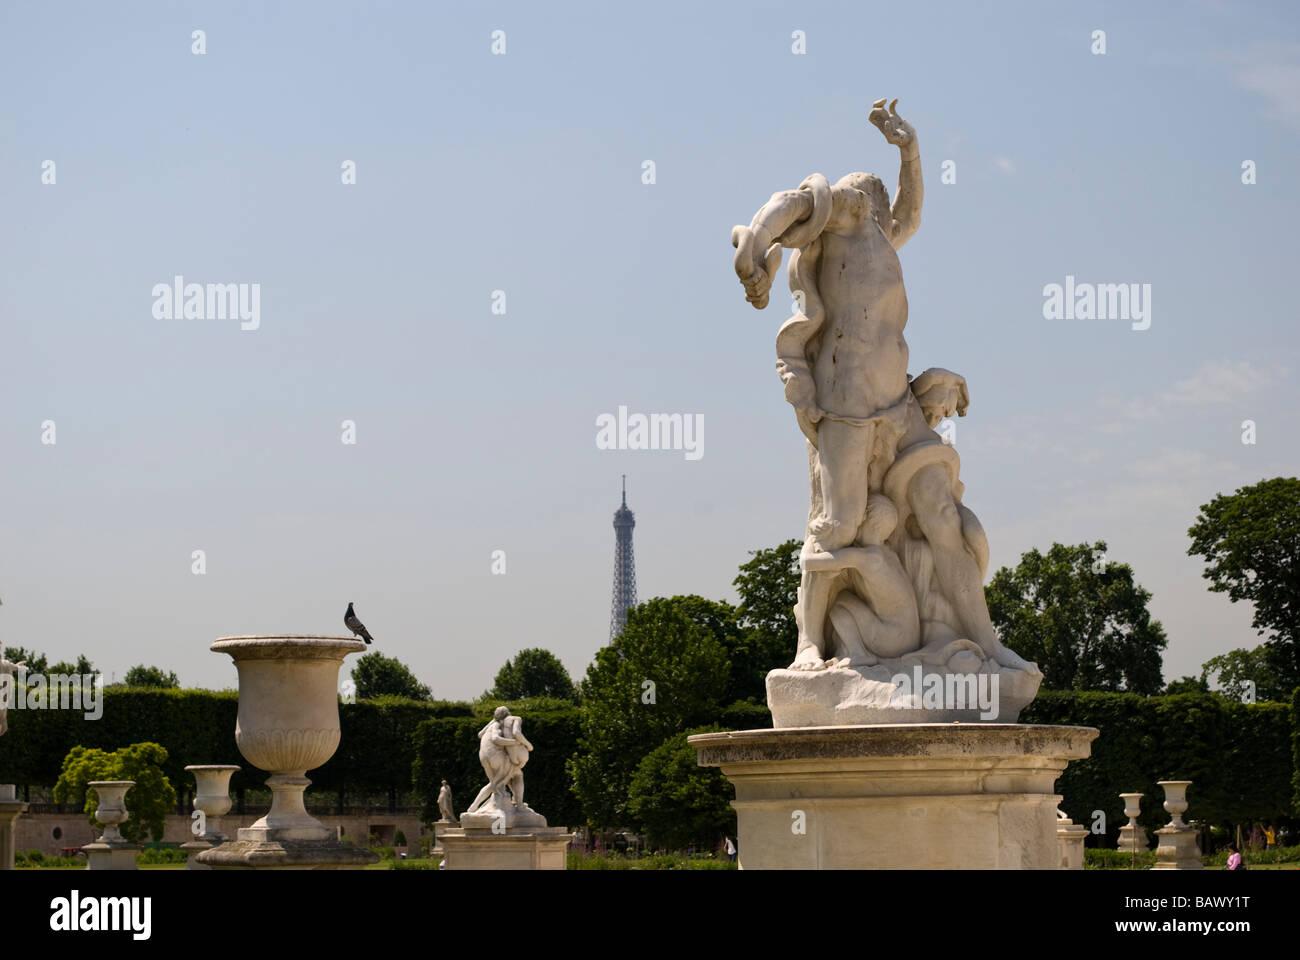 Statue in Jardin des Tuileries - Stock Image